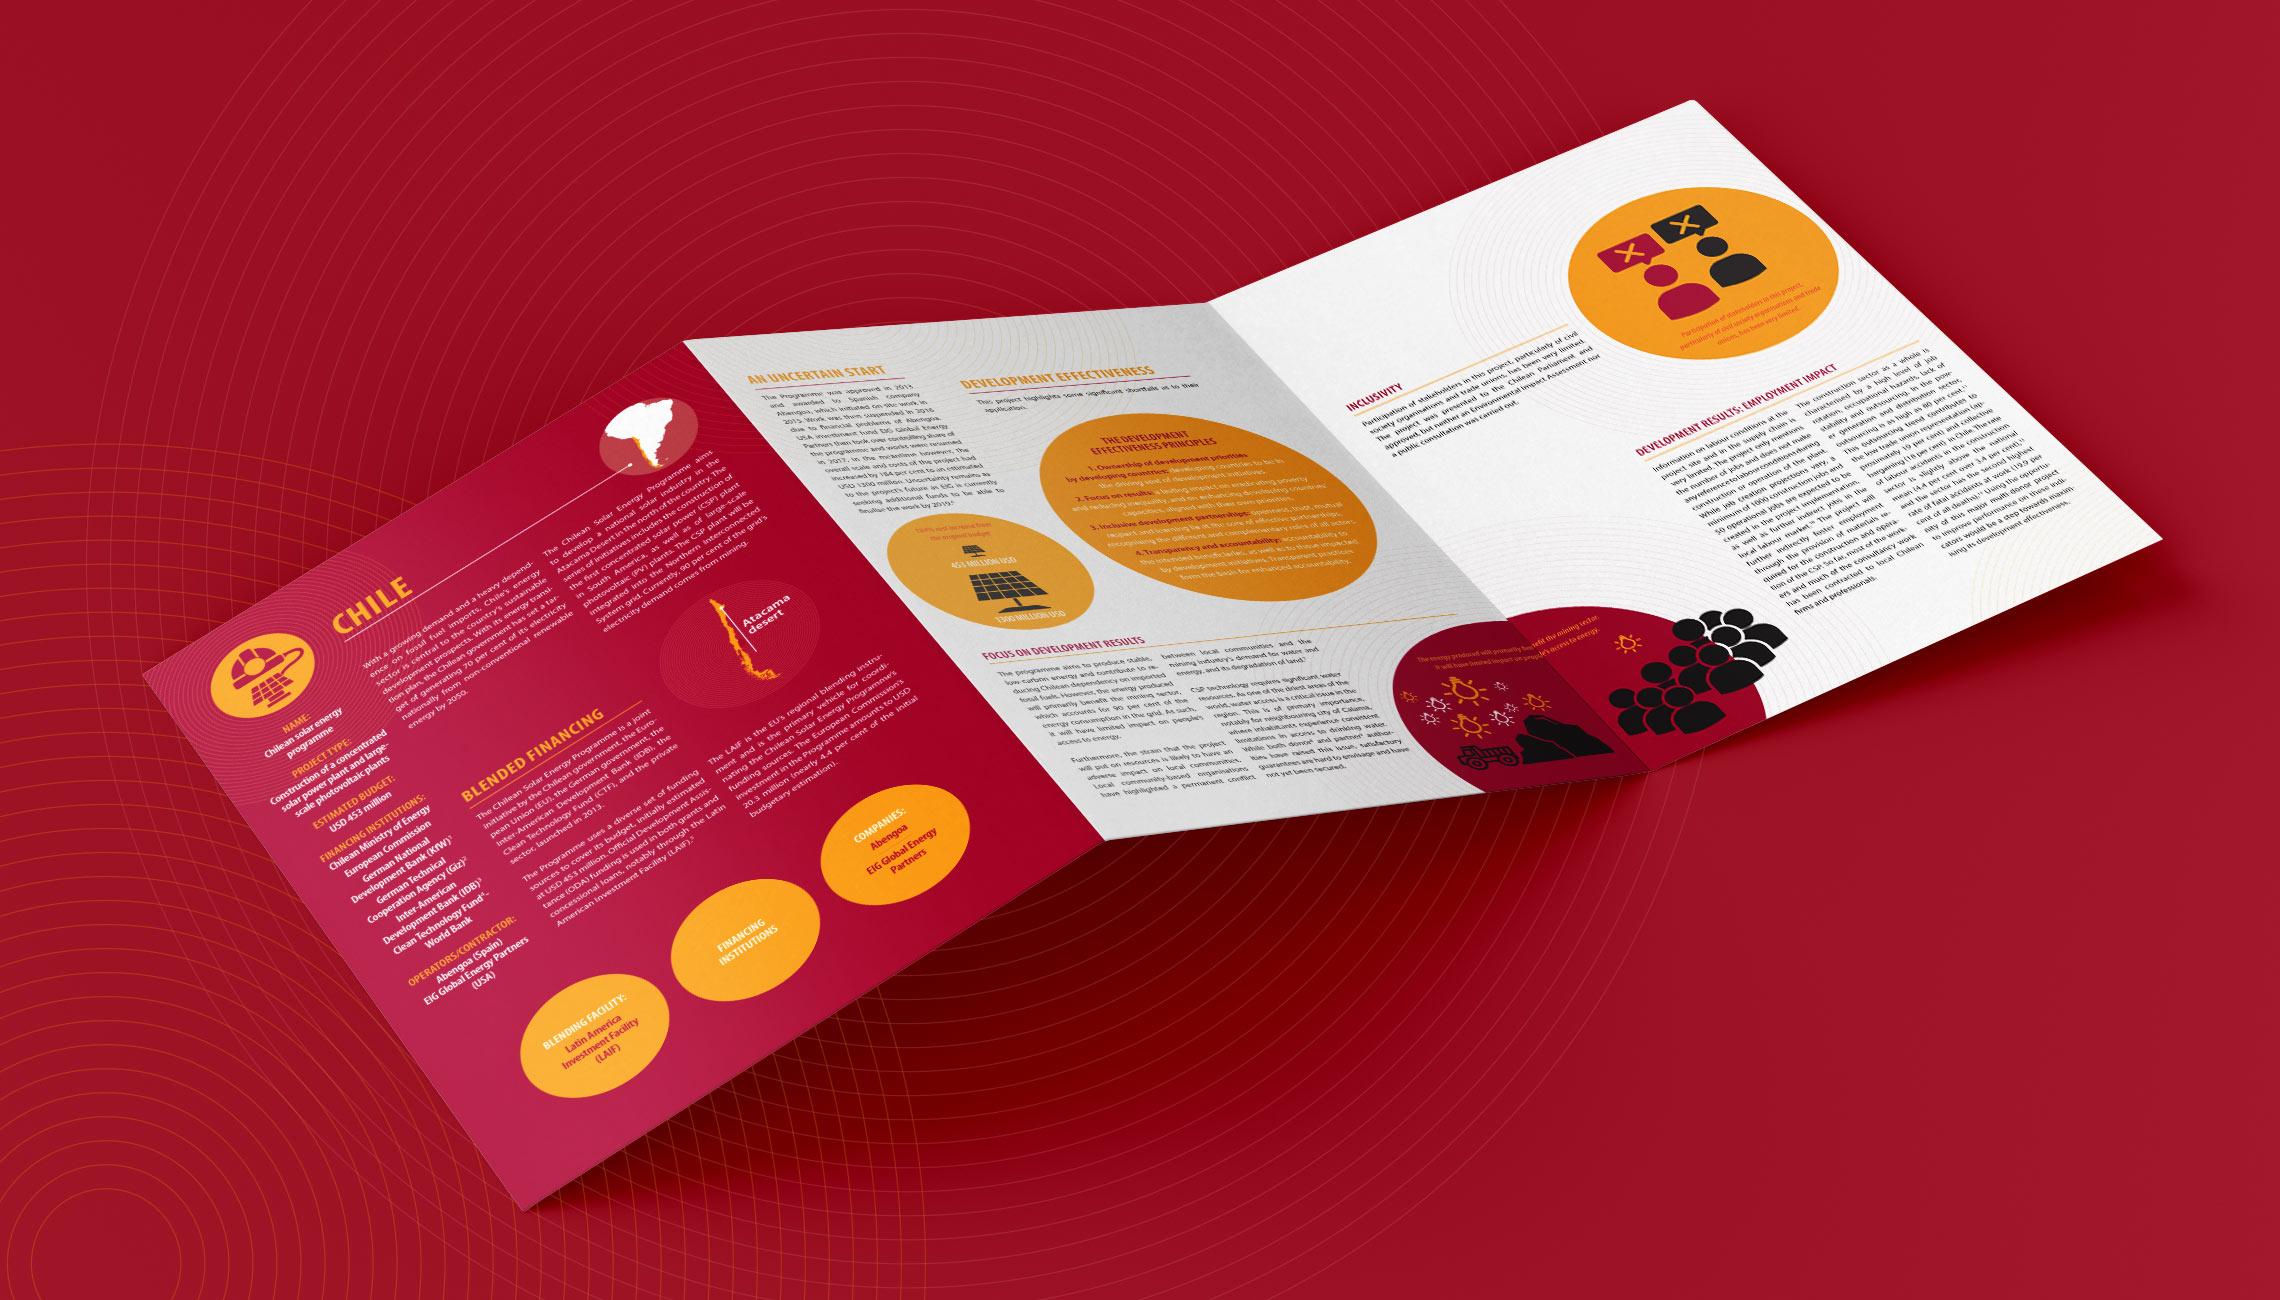 publication: SDGs and development programs impact reports - image 2